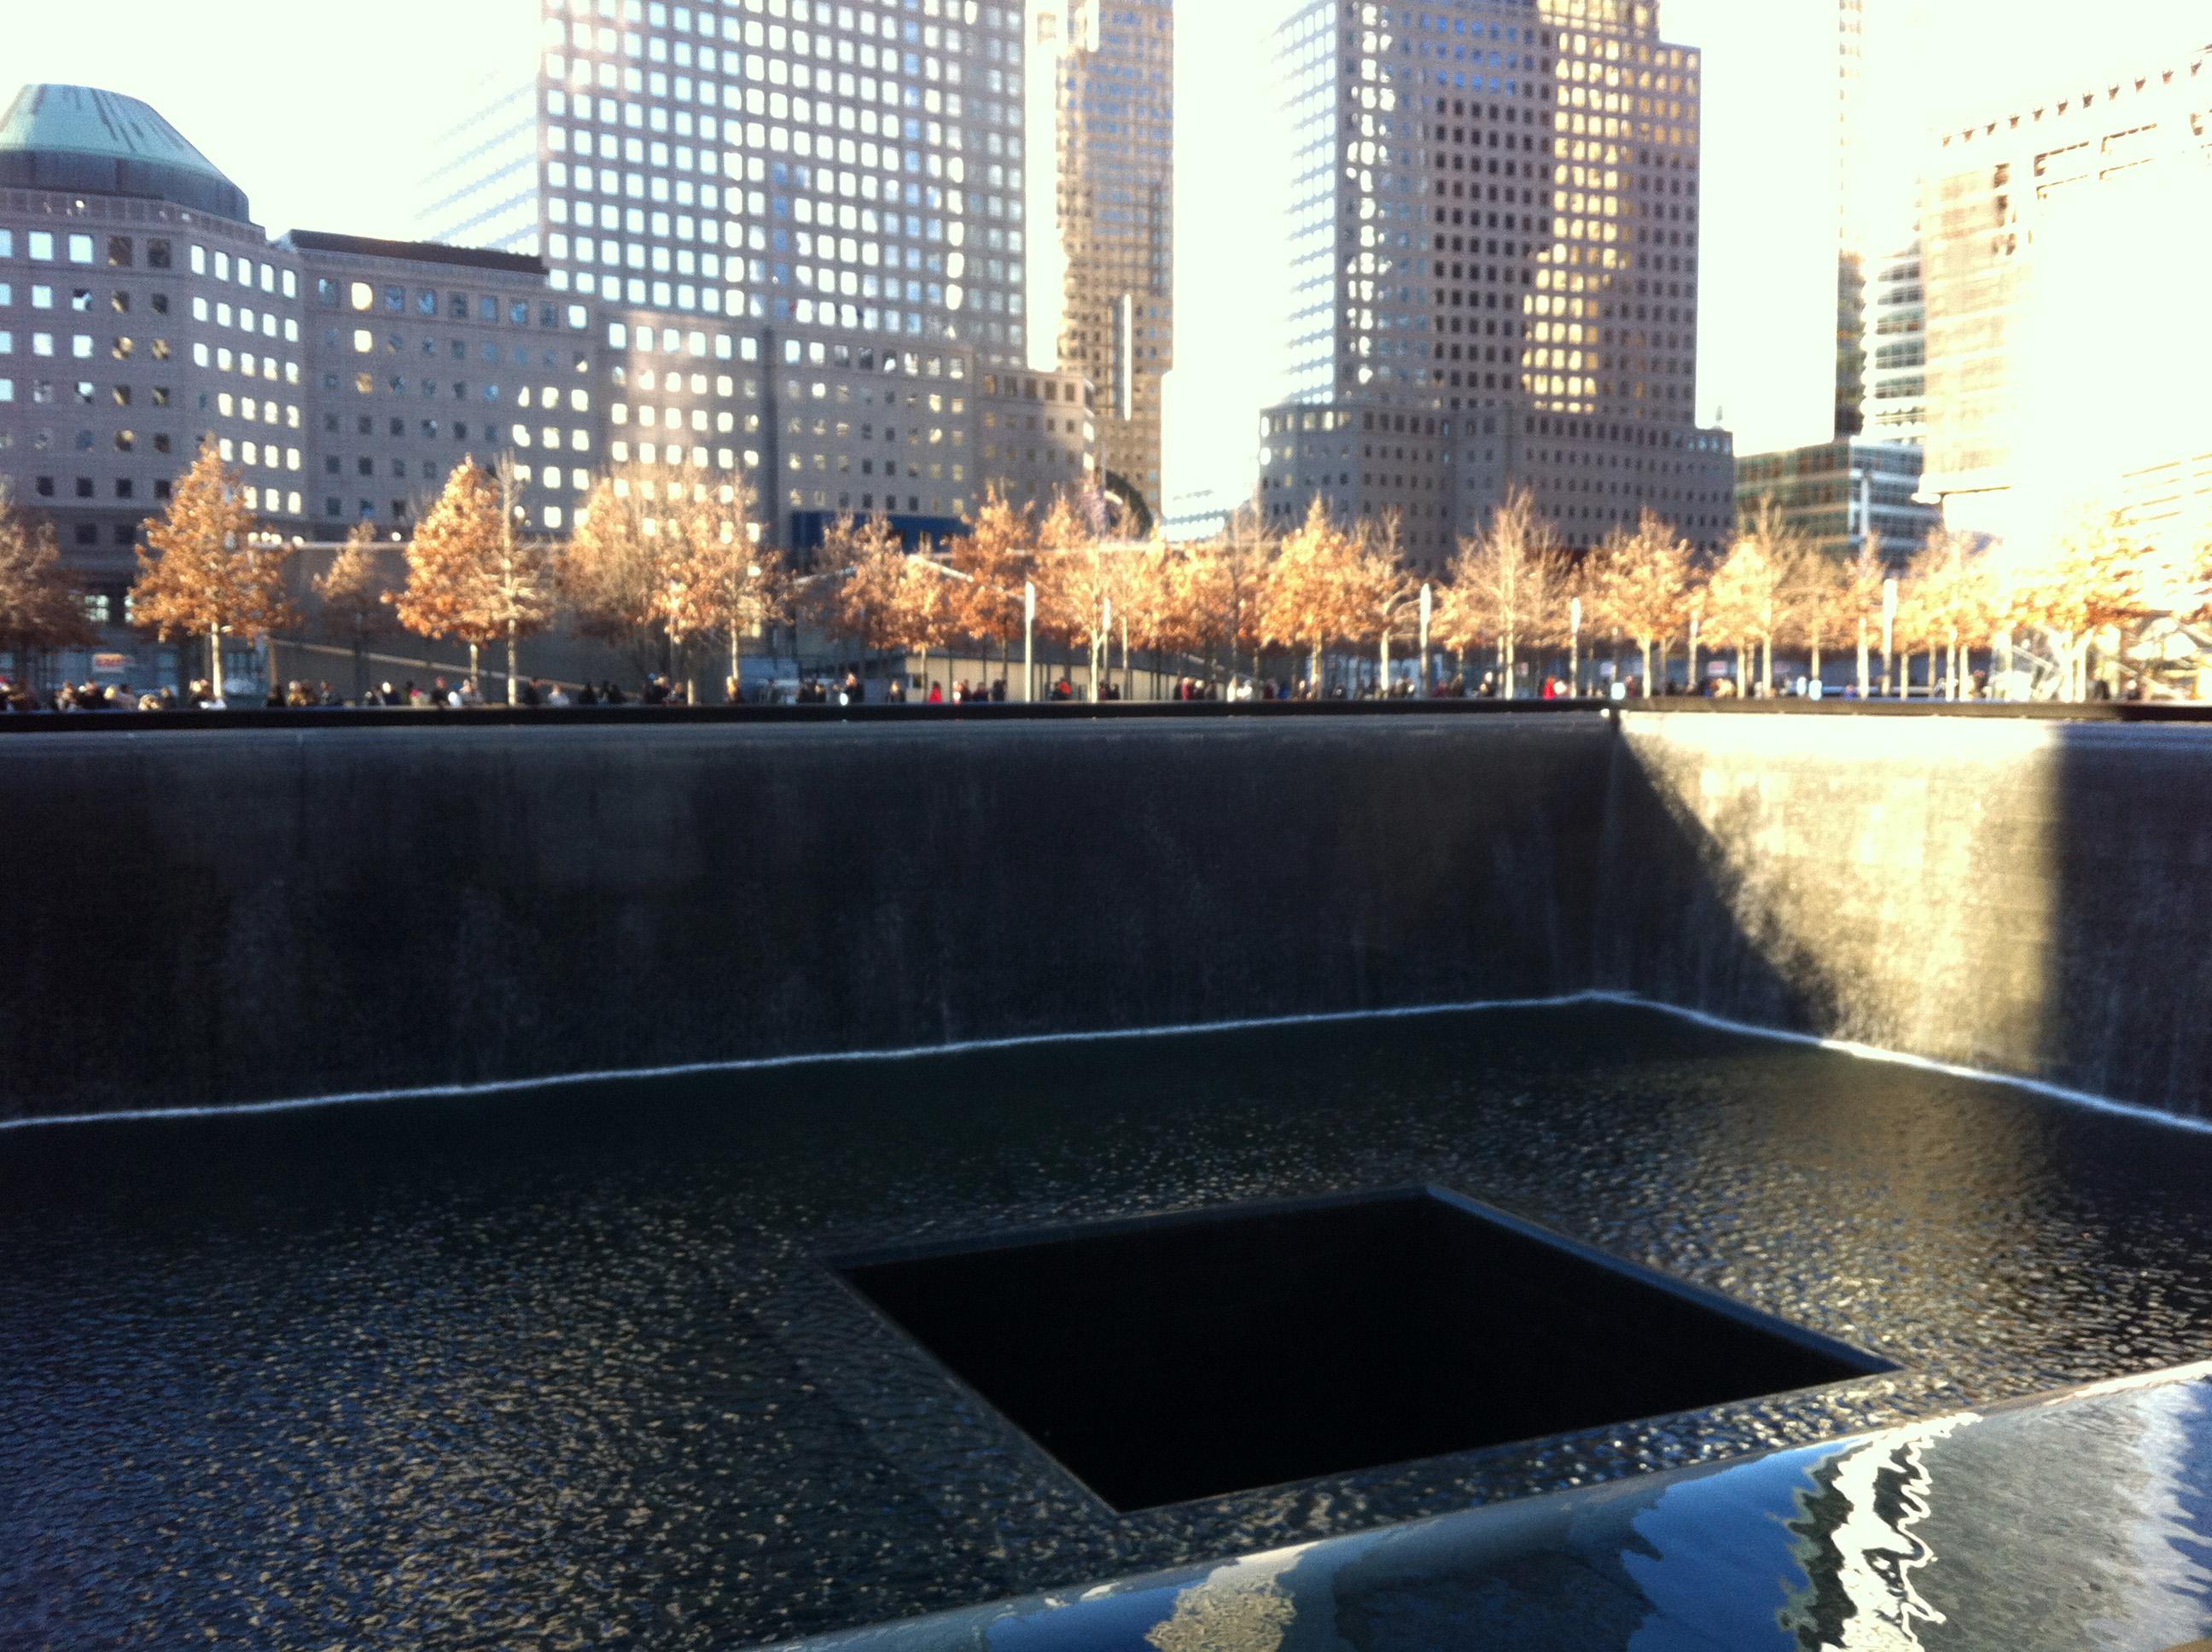 World Trade Center Memorial | Photo by Wilson Carletti